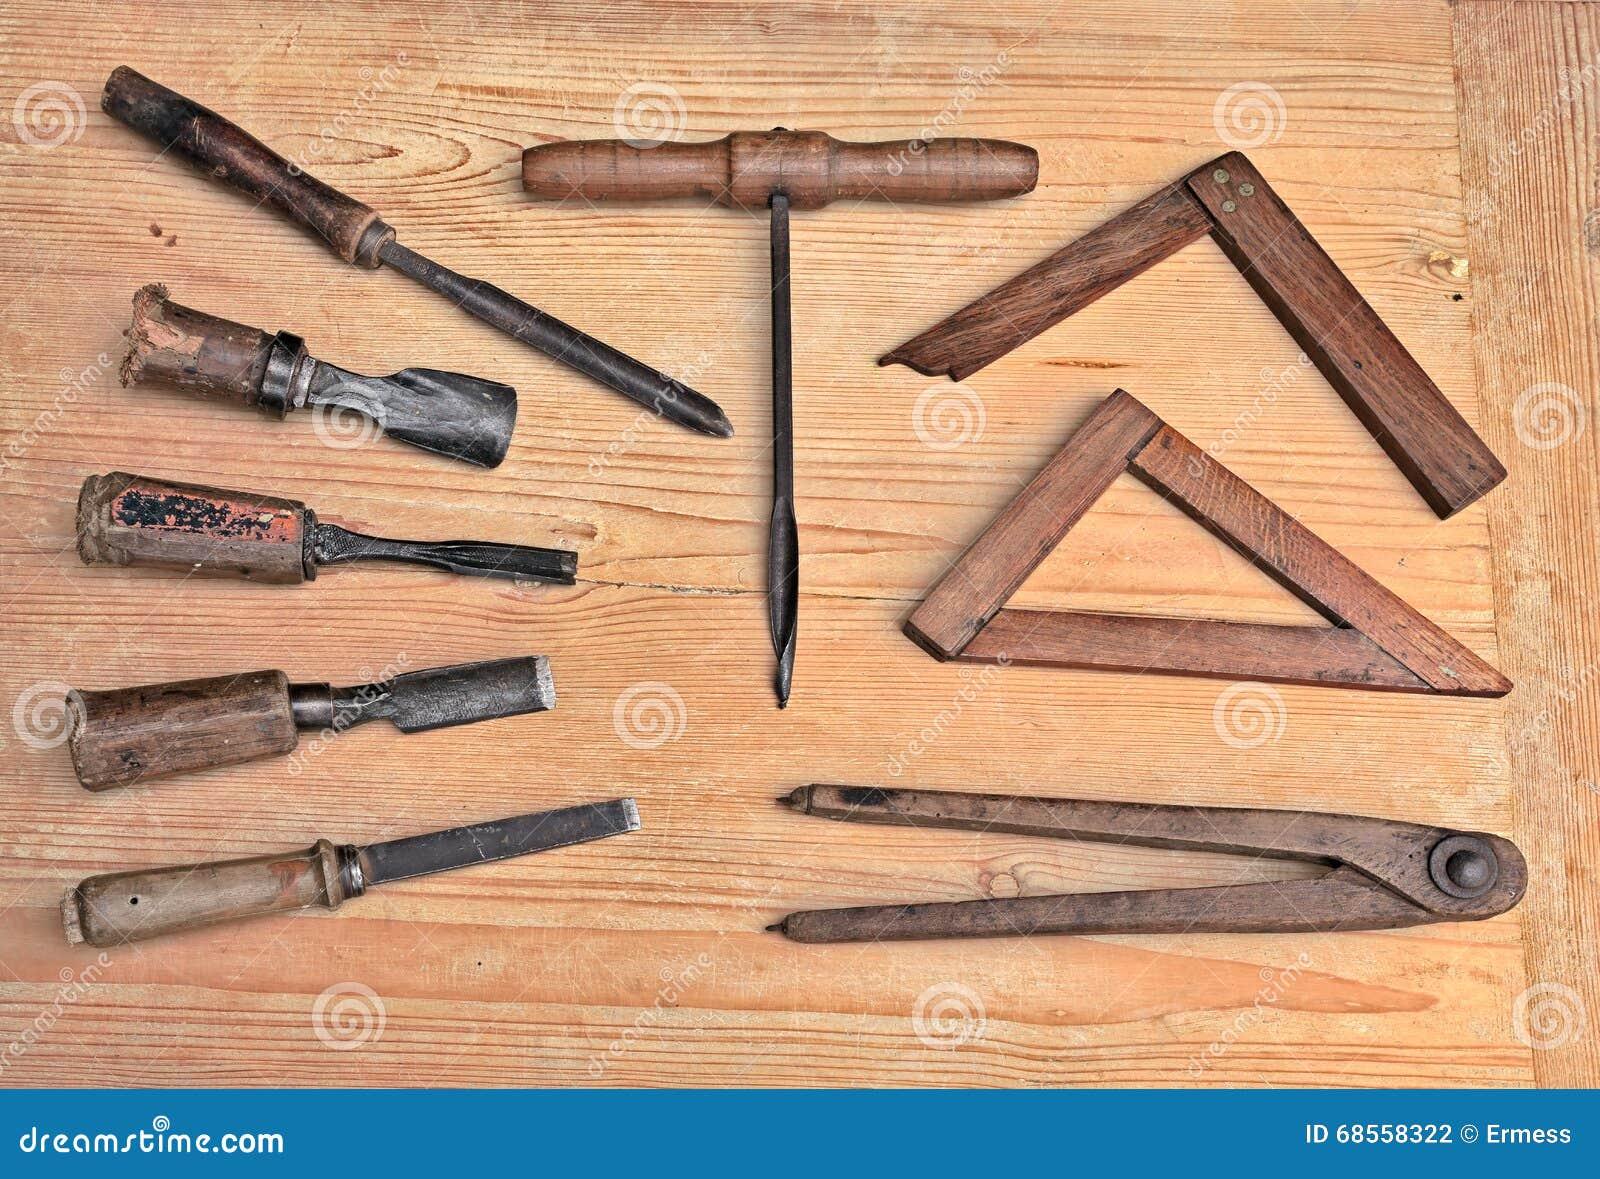 Old Woodworking Tools Stock Photo Image Of Artisanship 68558322